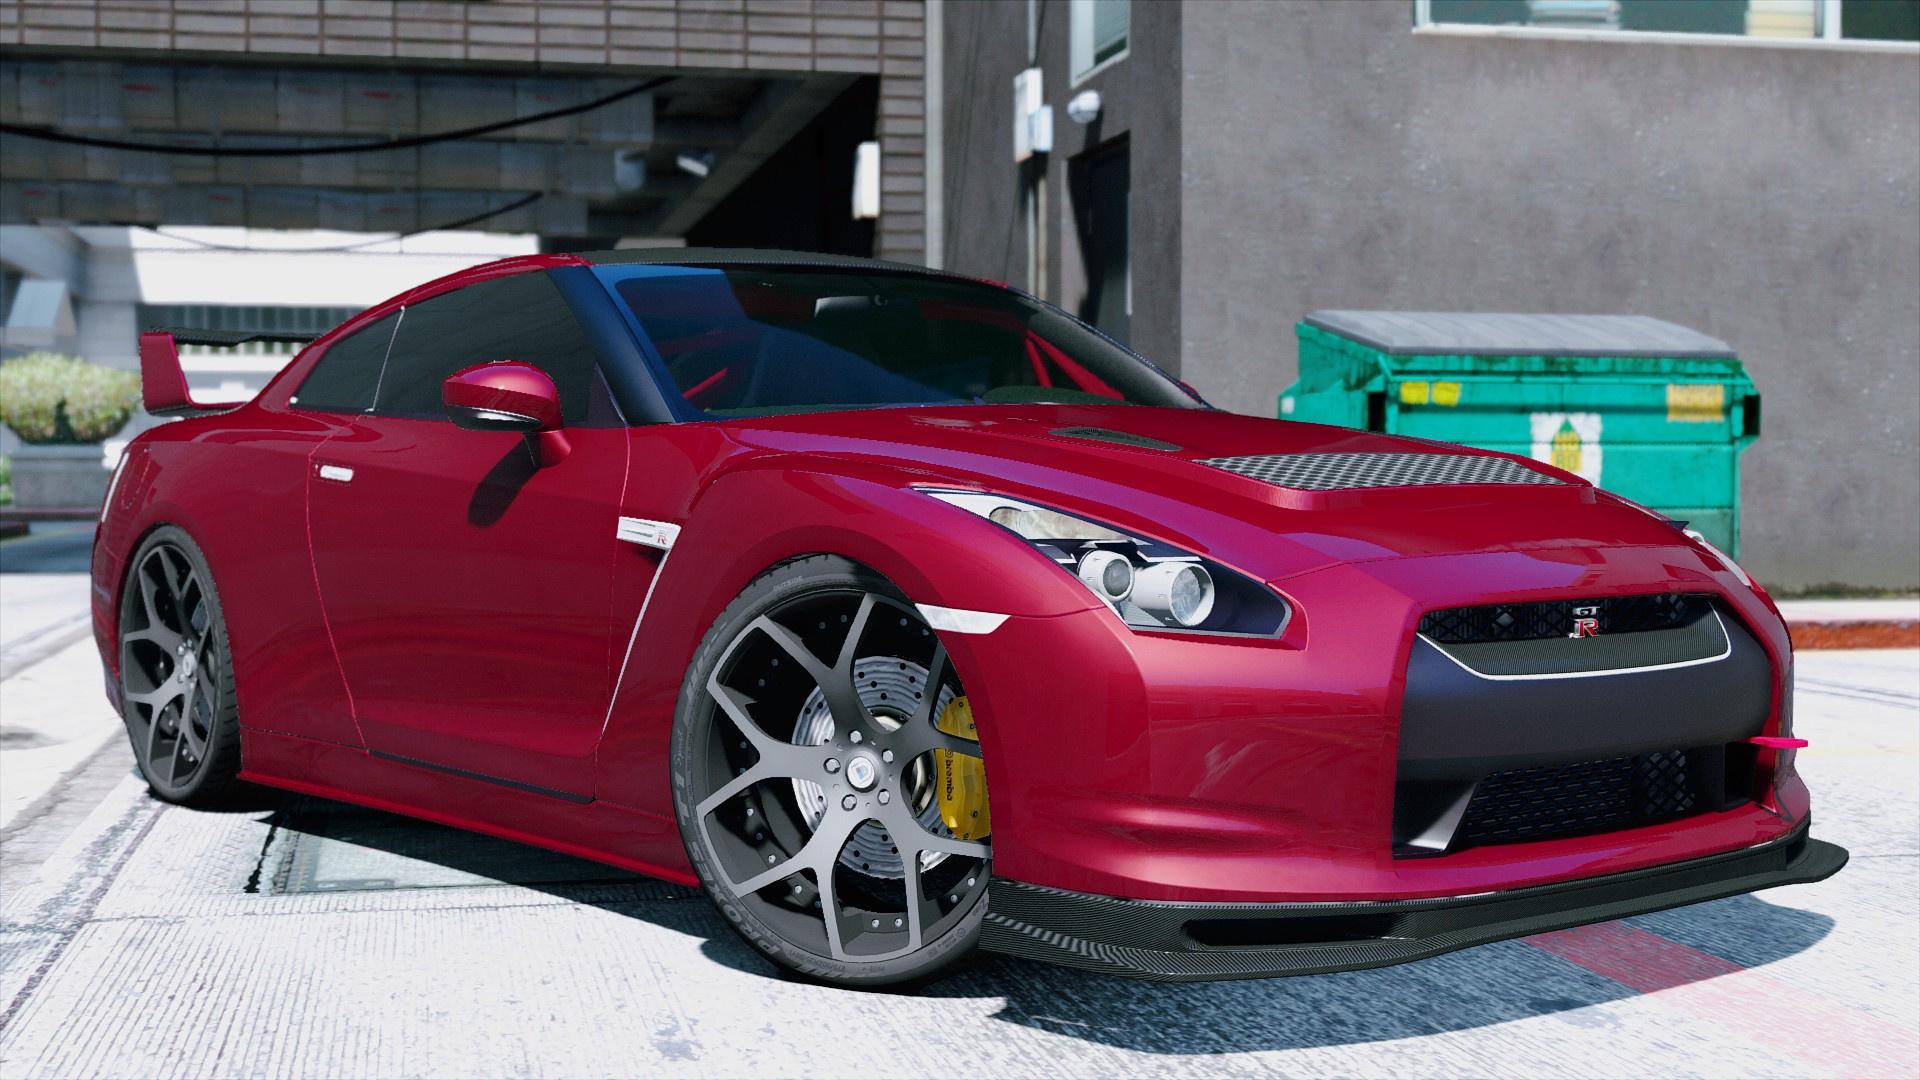 Nissan GT-R R35 [Tuning] - GTA5-Mods.com